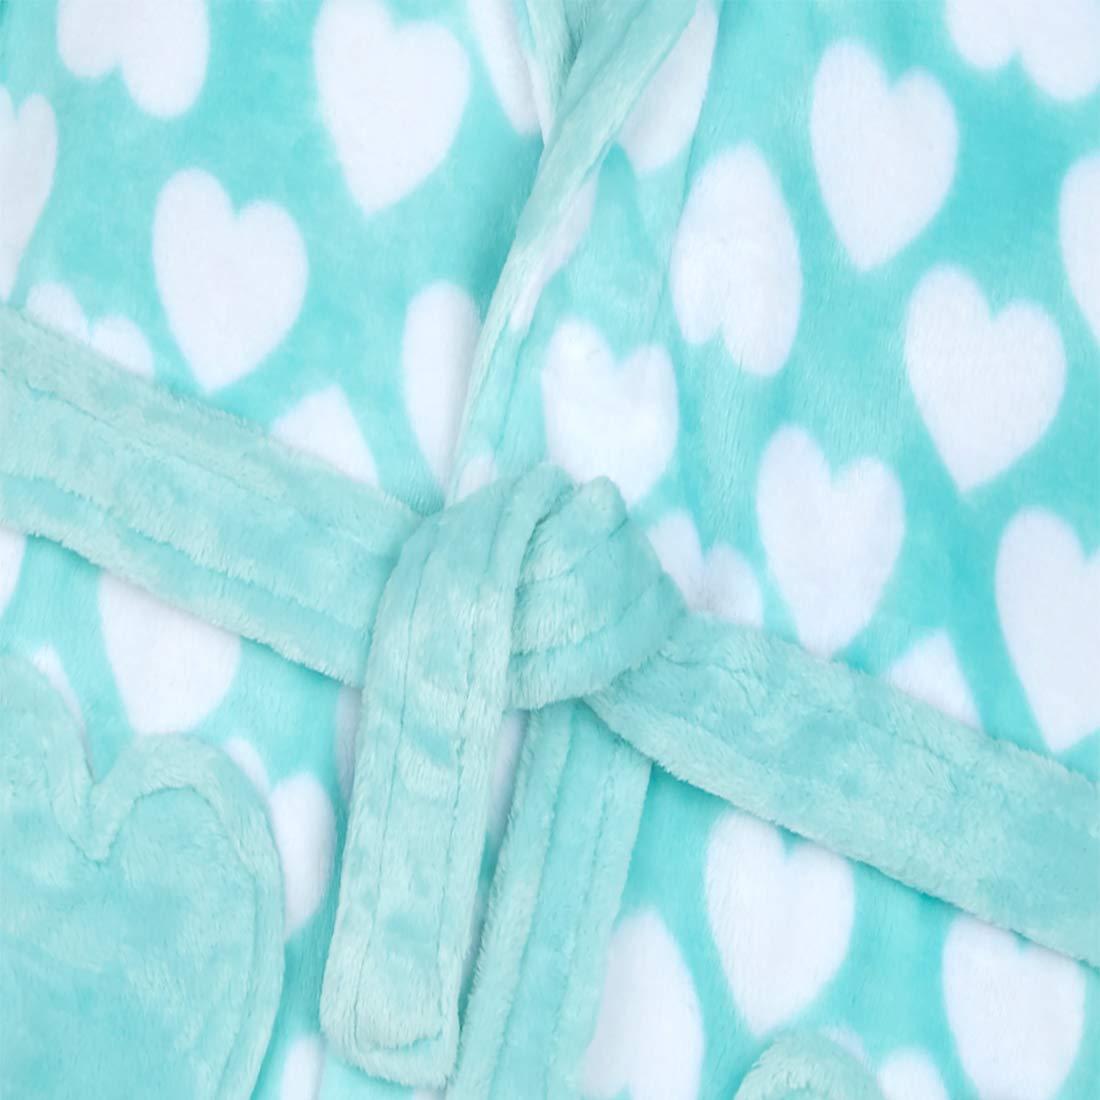 4Kids Boys Girls Nightwear Childrens Dressing Novelty Gown Fun Robe